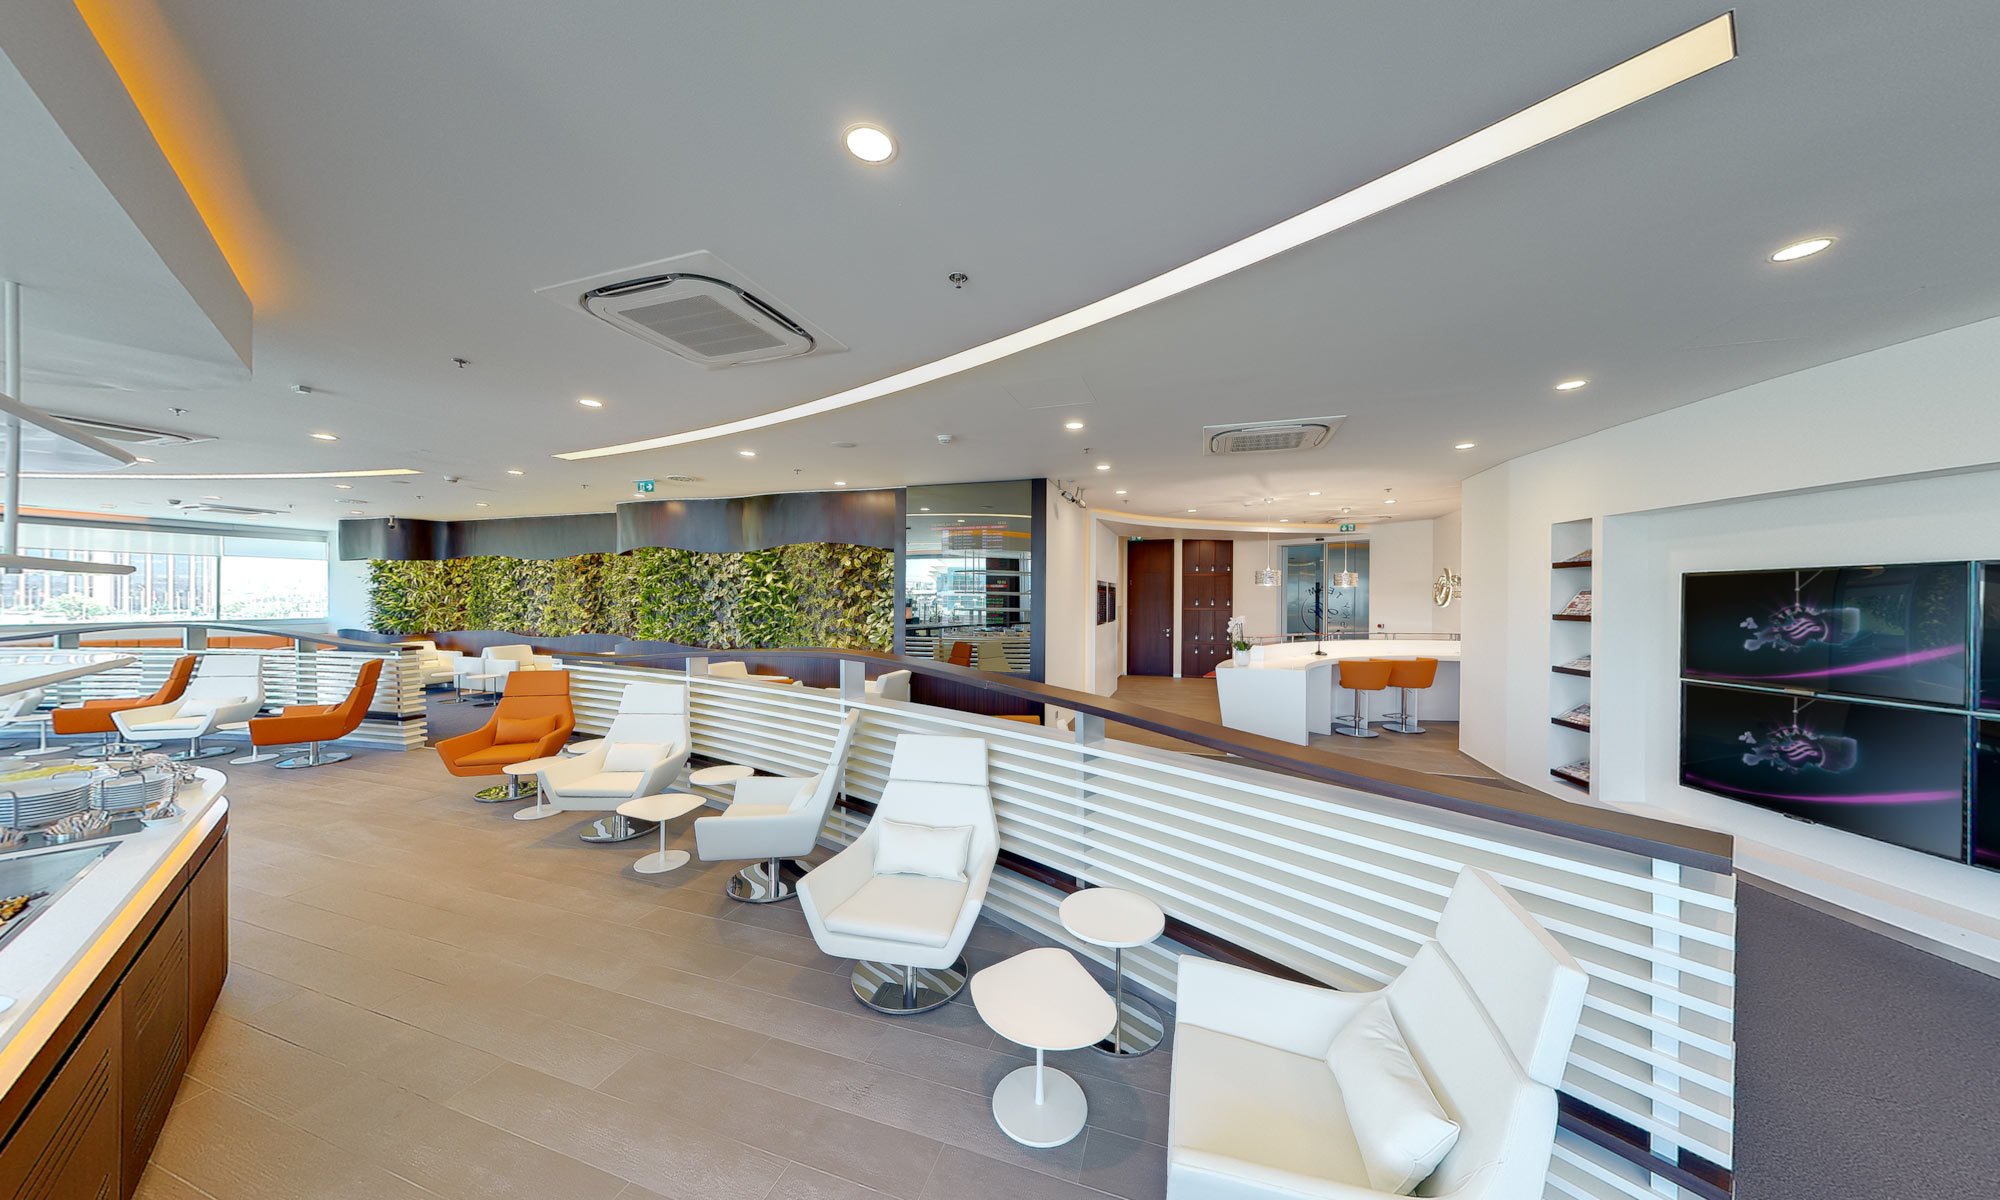 Neue Skyteam Lounge Am Flughafen Istanbul Atat 252 Rk Er 246 Ffnet